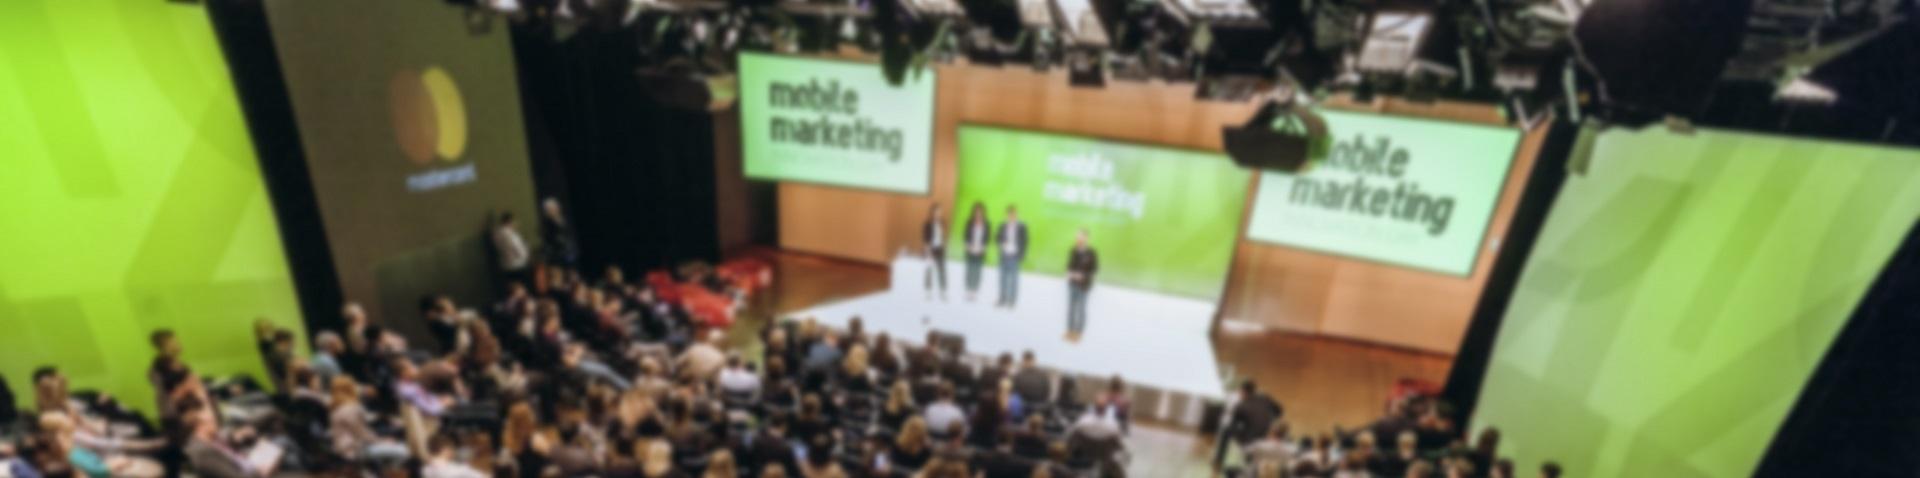 Mobile Marketing Innovation Days